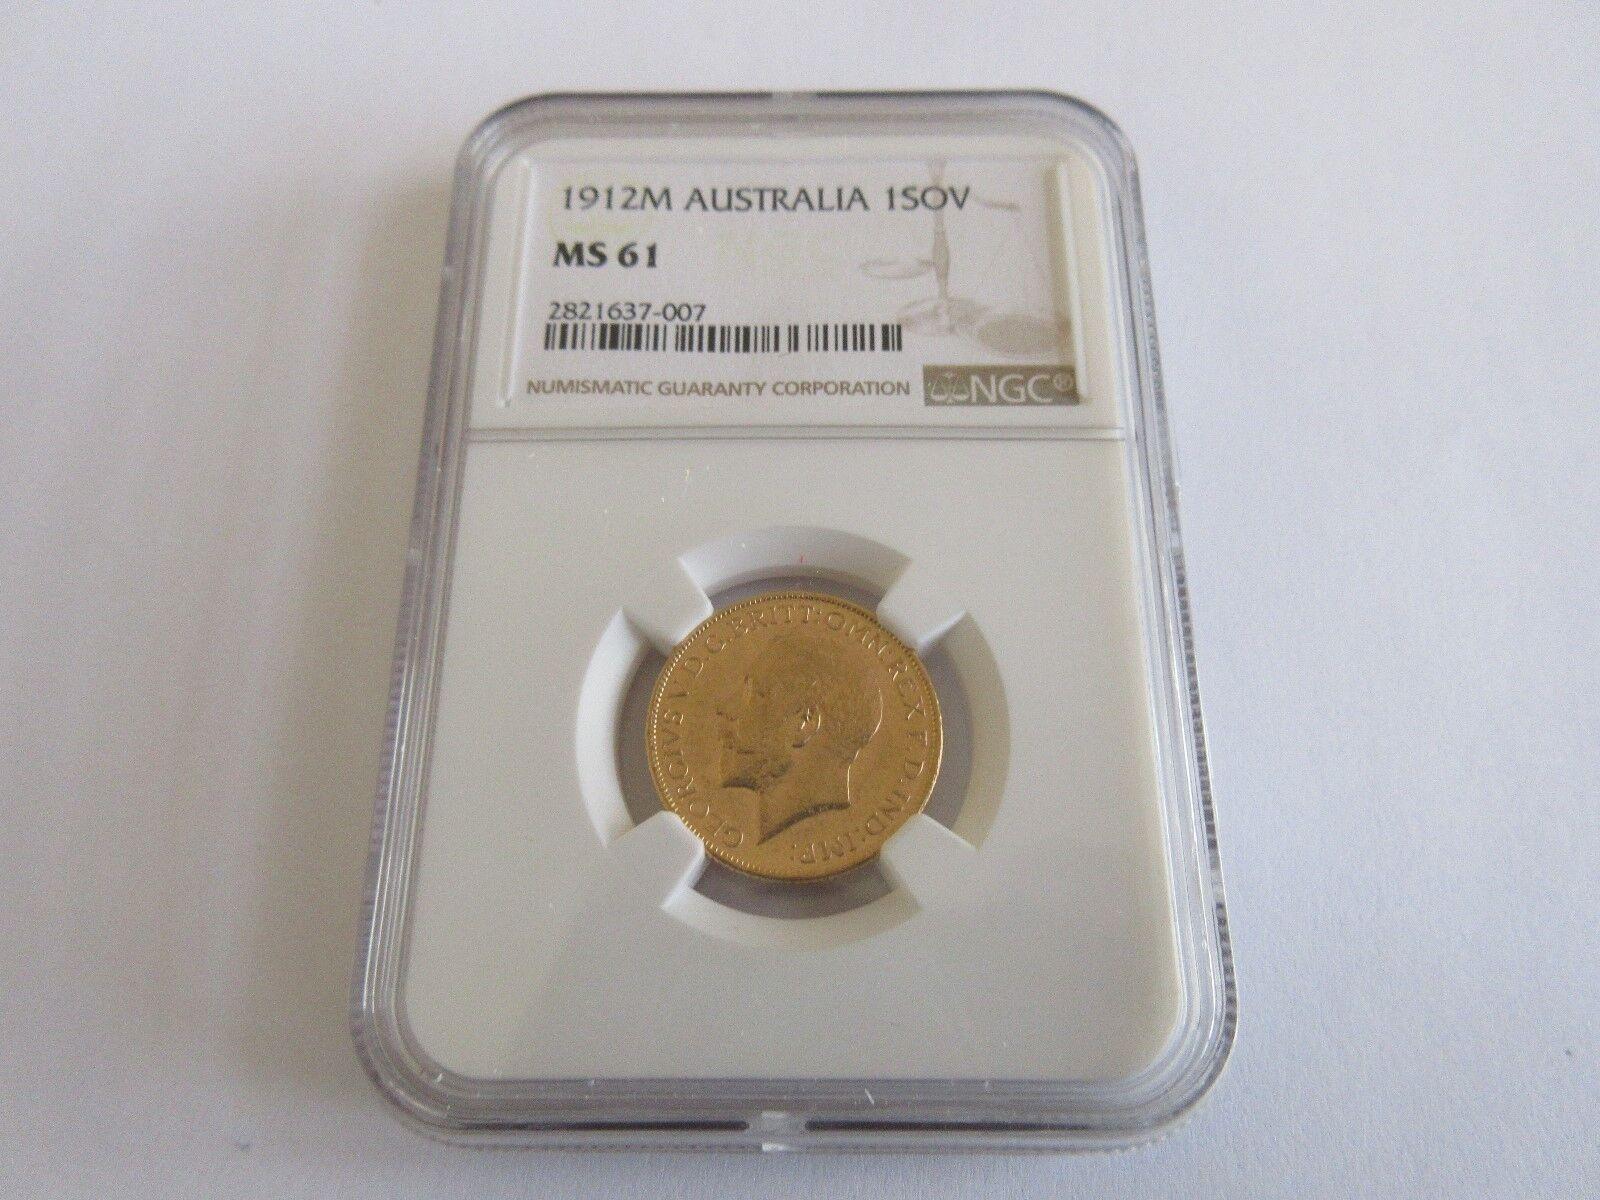 1912M , Australia , 1Sov , NGC , MS 61